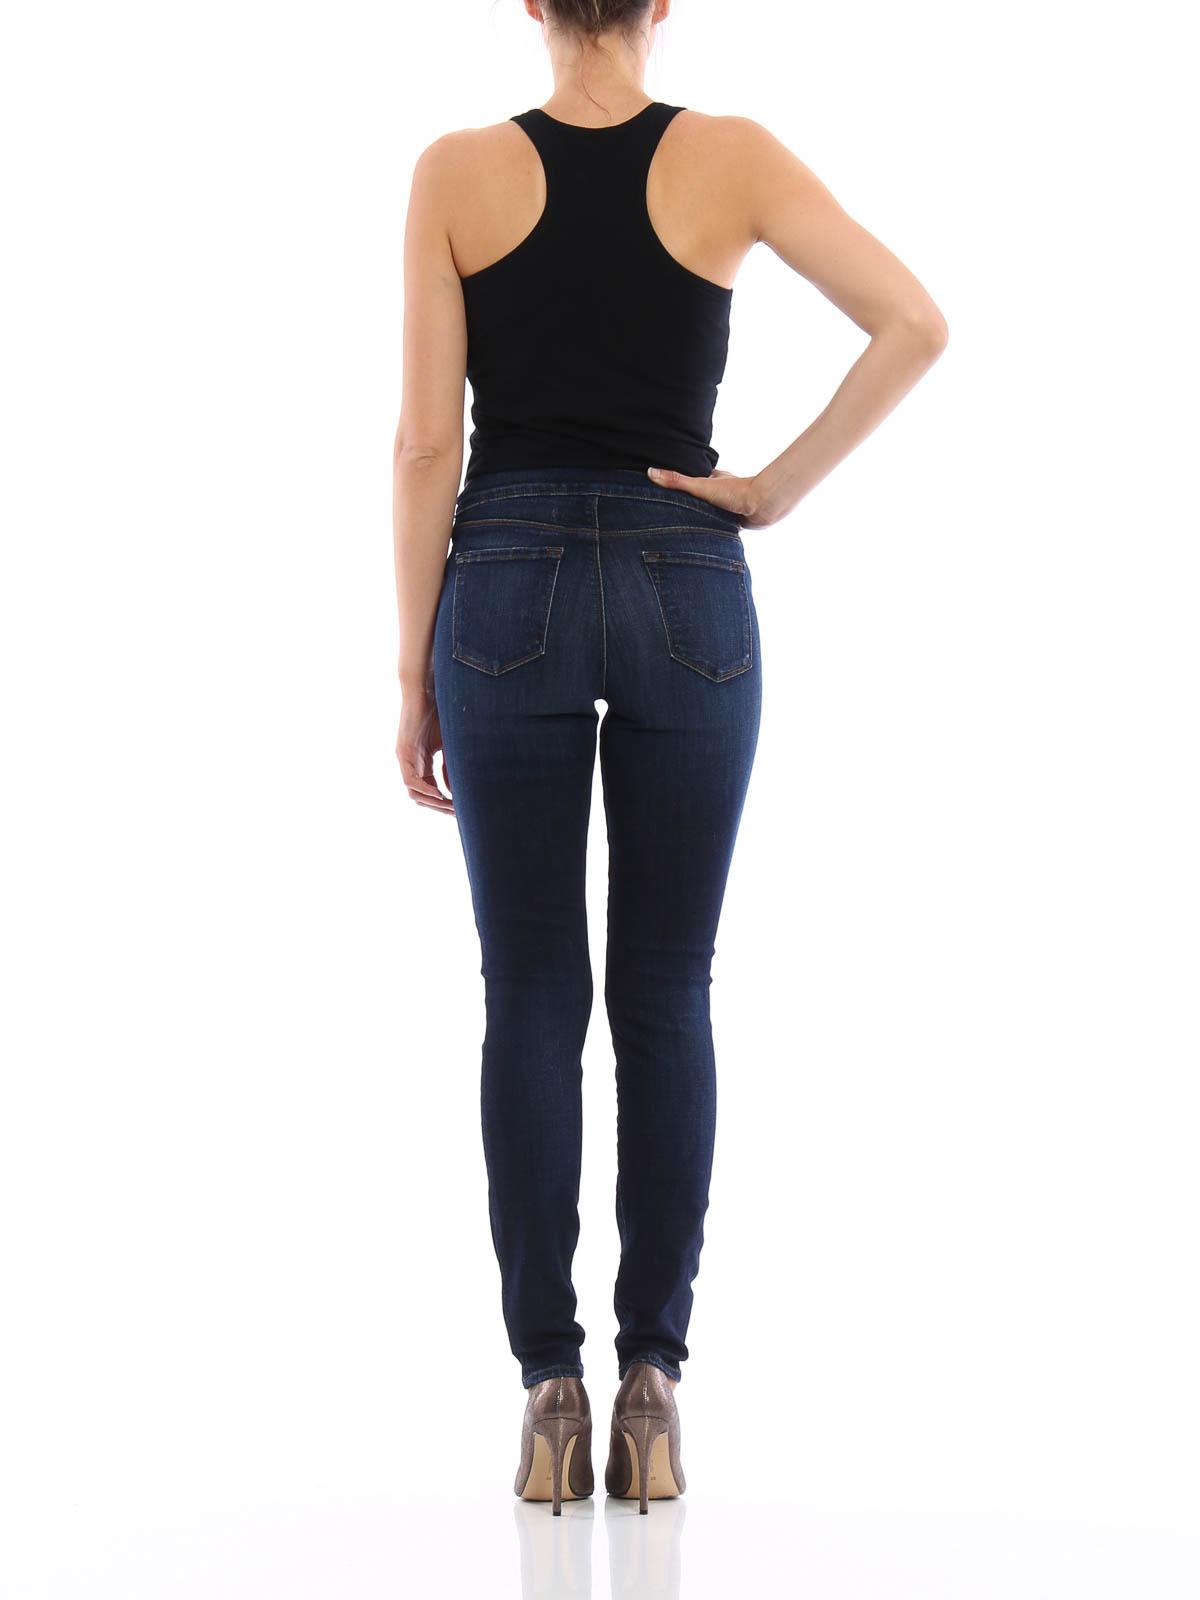 Givenchy Jeans Men